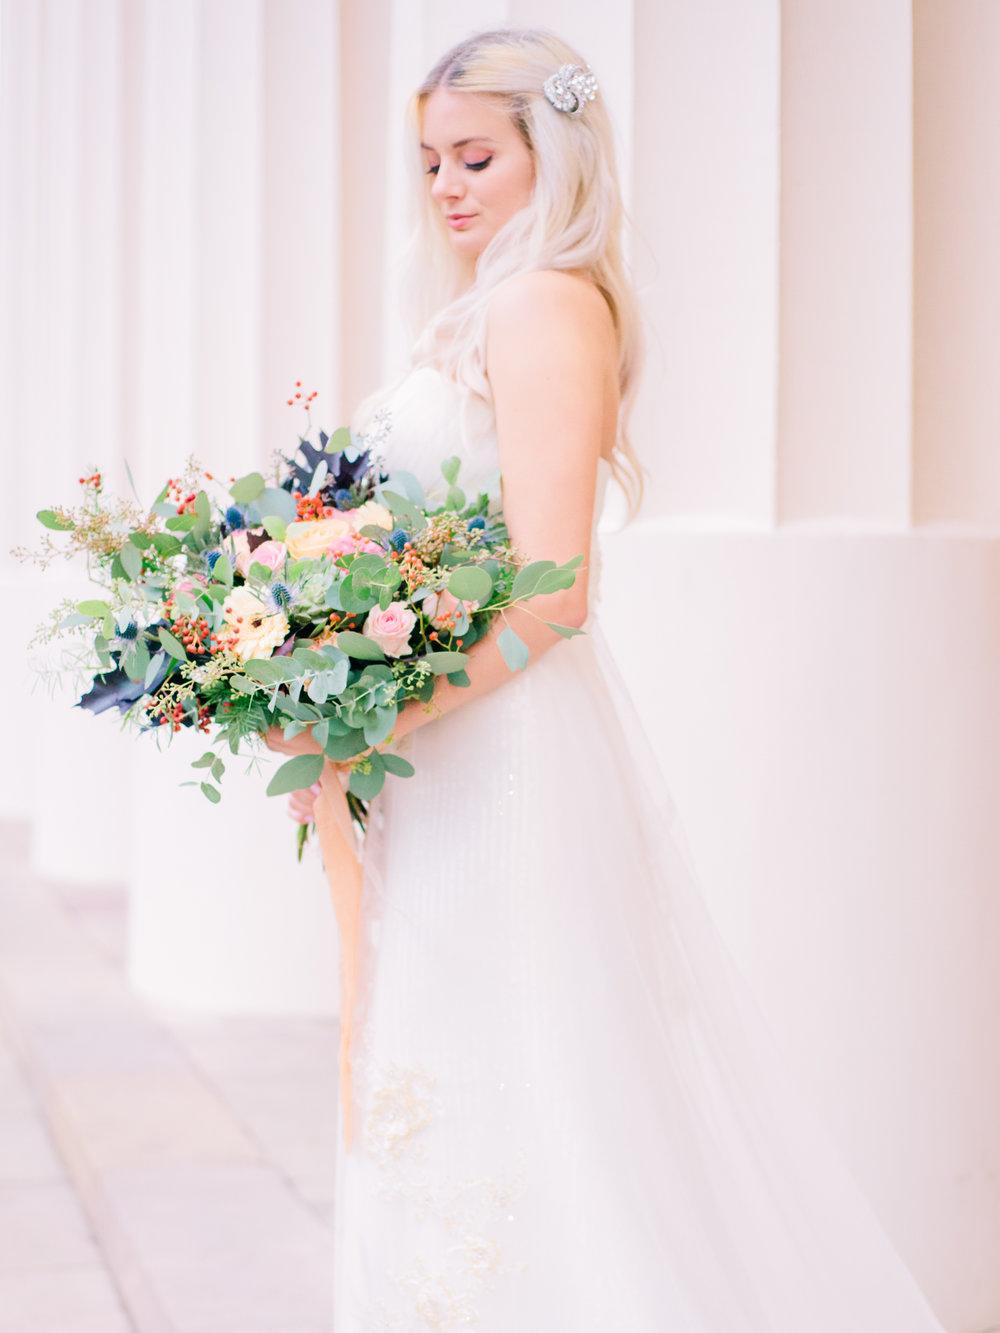 Elegant Organic Fall Swedish Bridal Wedding Styled Shoot - Erika Alvarenga Photography-64.jpg